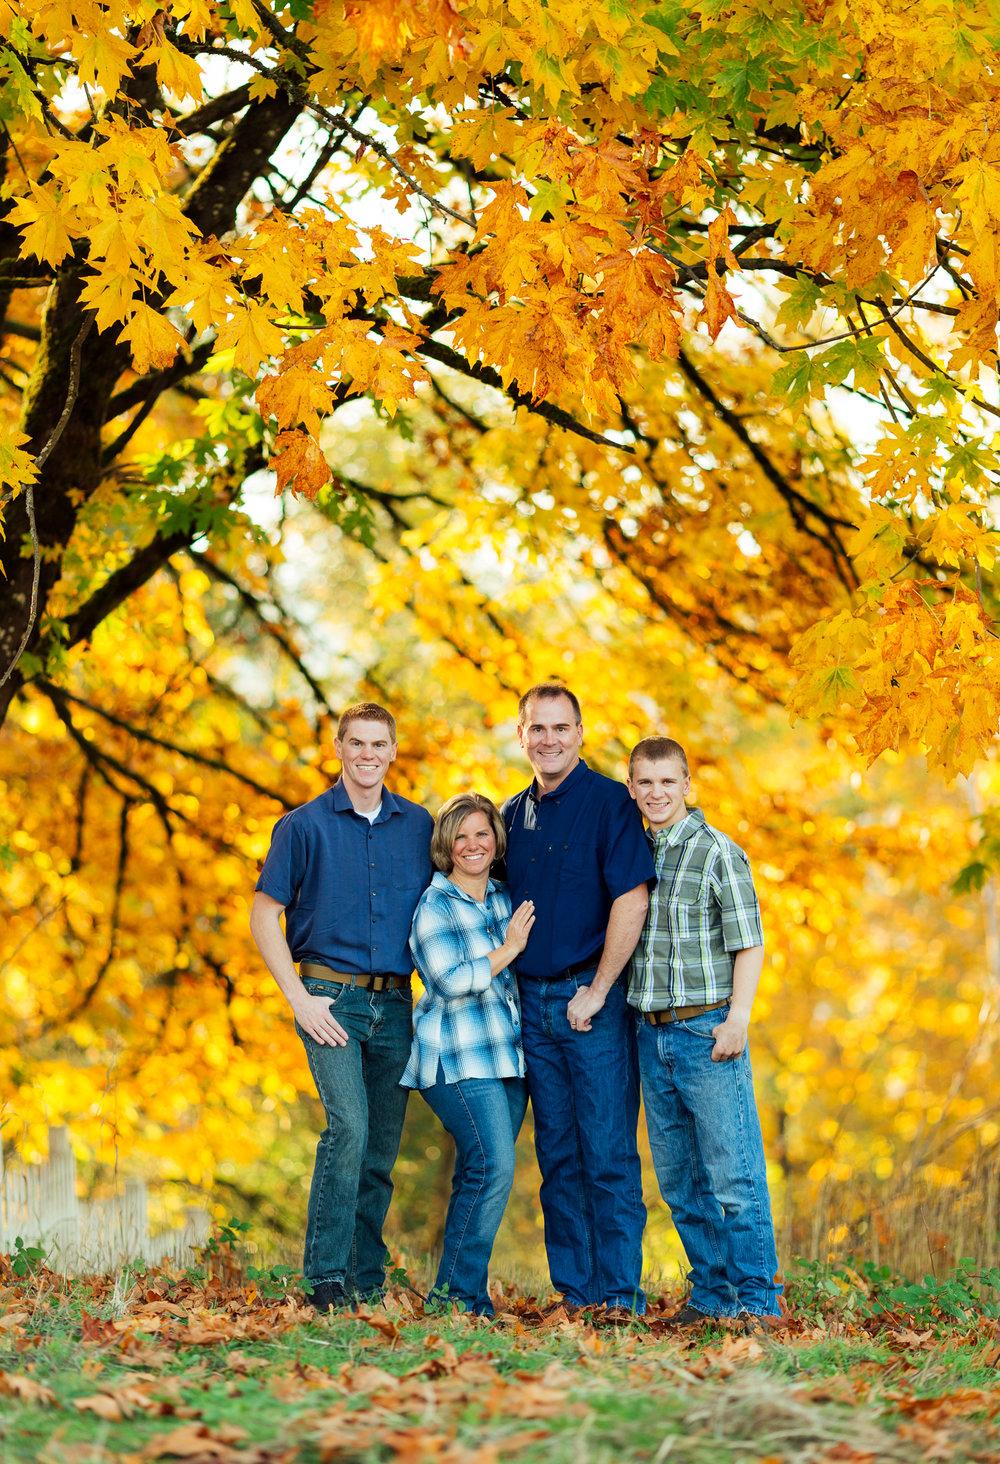 ariellanoellephotography-family-portraits-fall-mini-session-duvall-monroe-washington-seattle-redmond-woodinville-sammamish-area-1-19.jpg